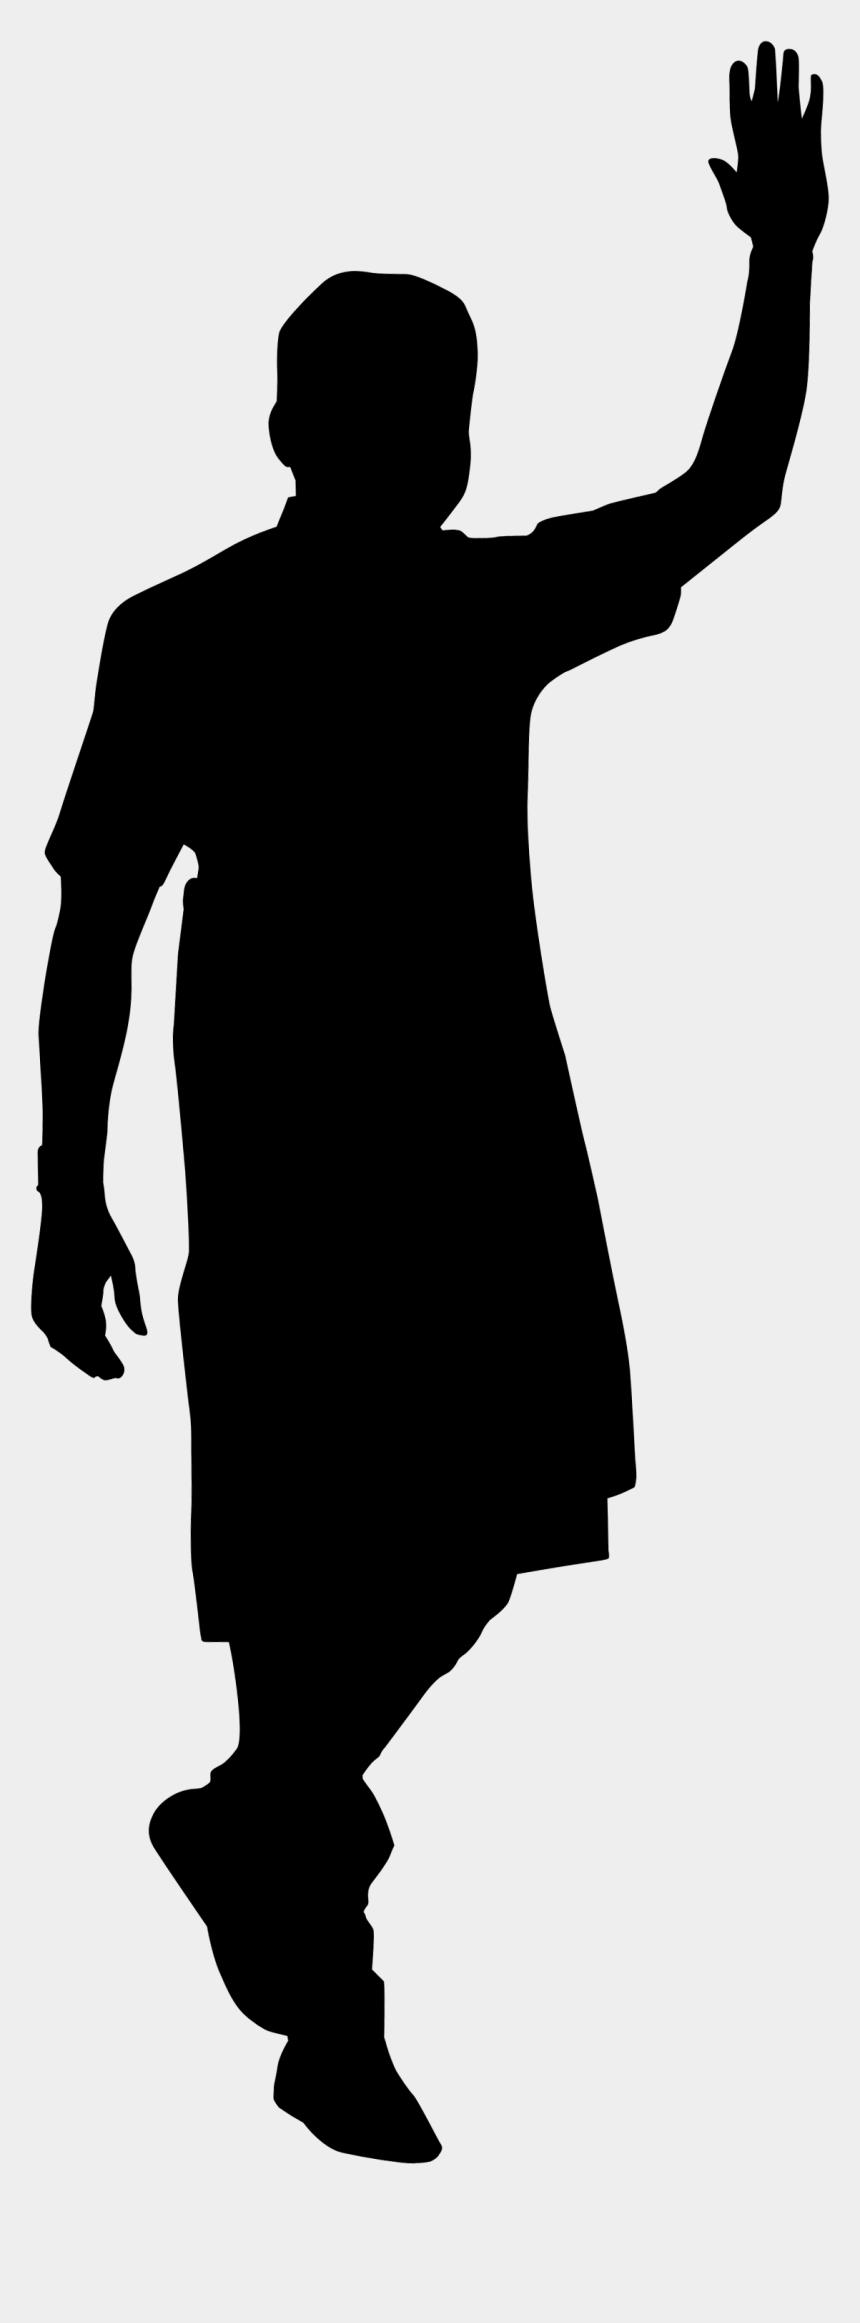 behavior clip art, Cartoons - Human Behavior Shoe Silhouette Clip Art - Behavior Png Clipart Transparent